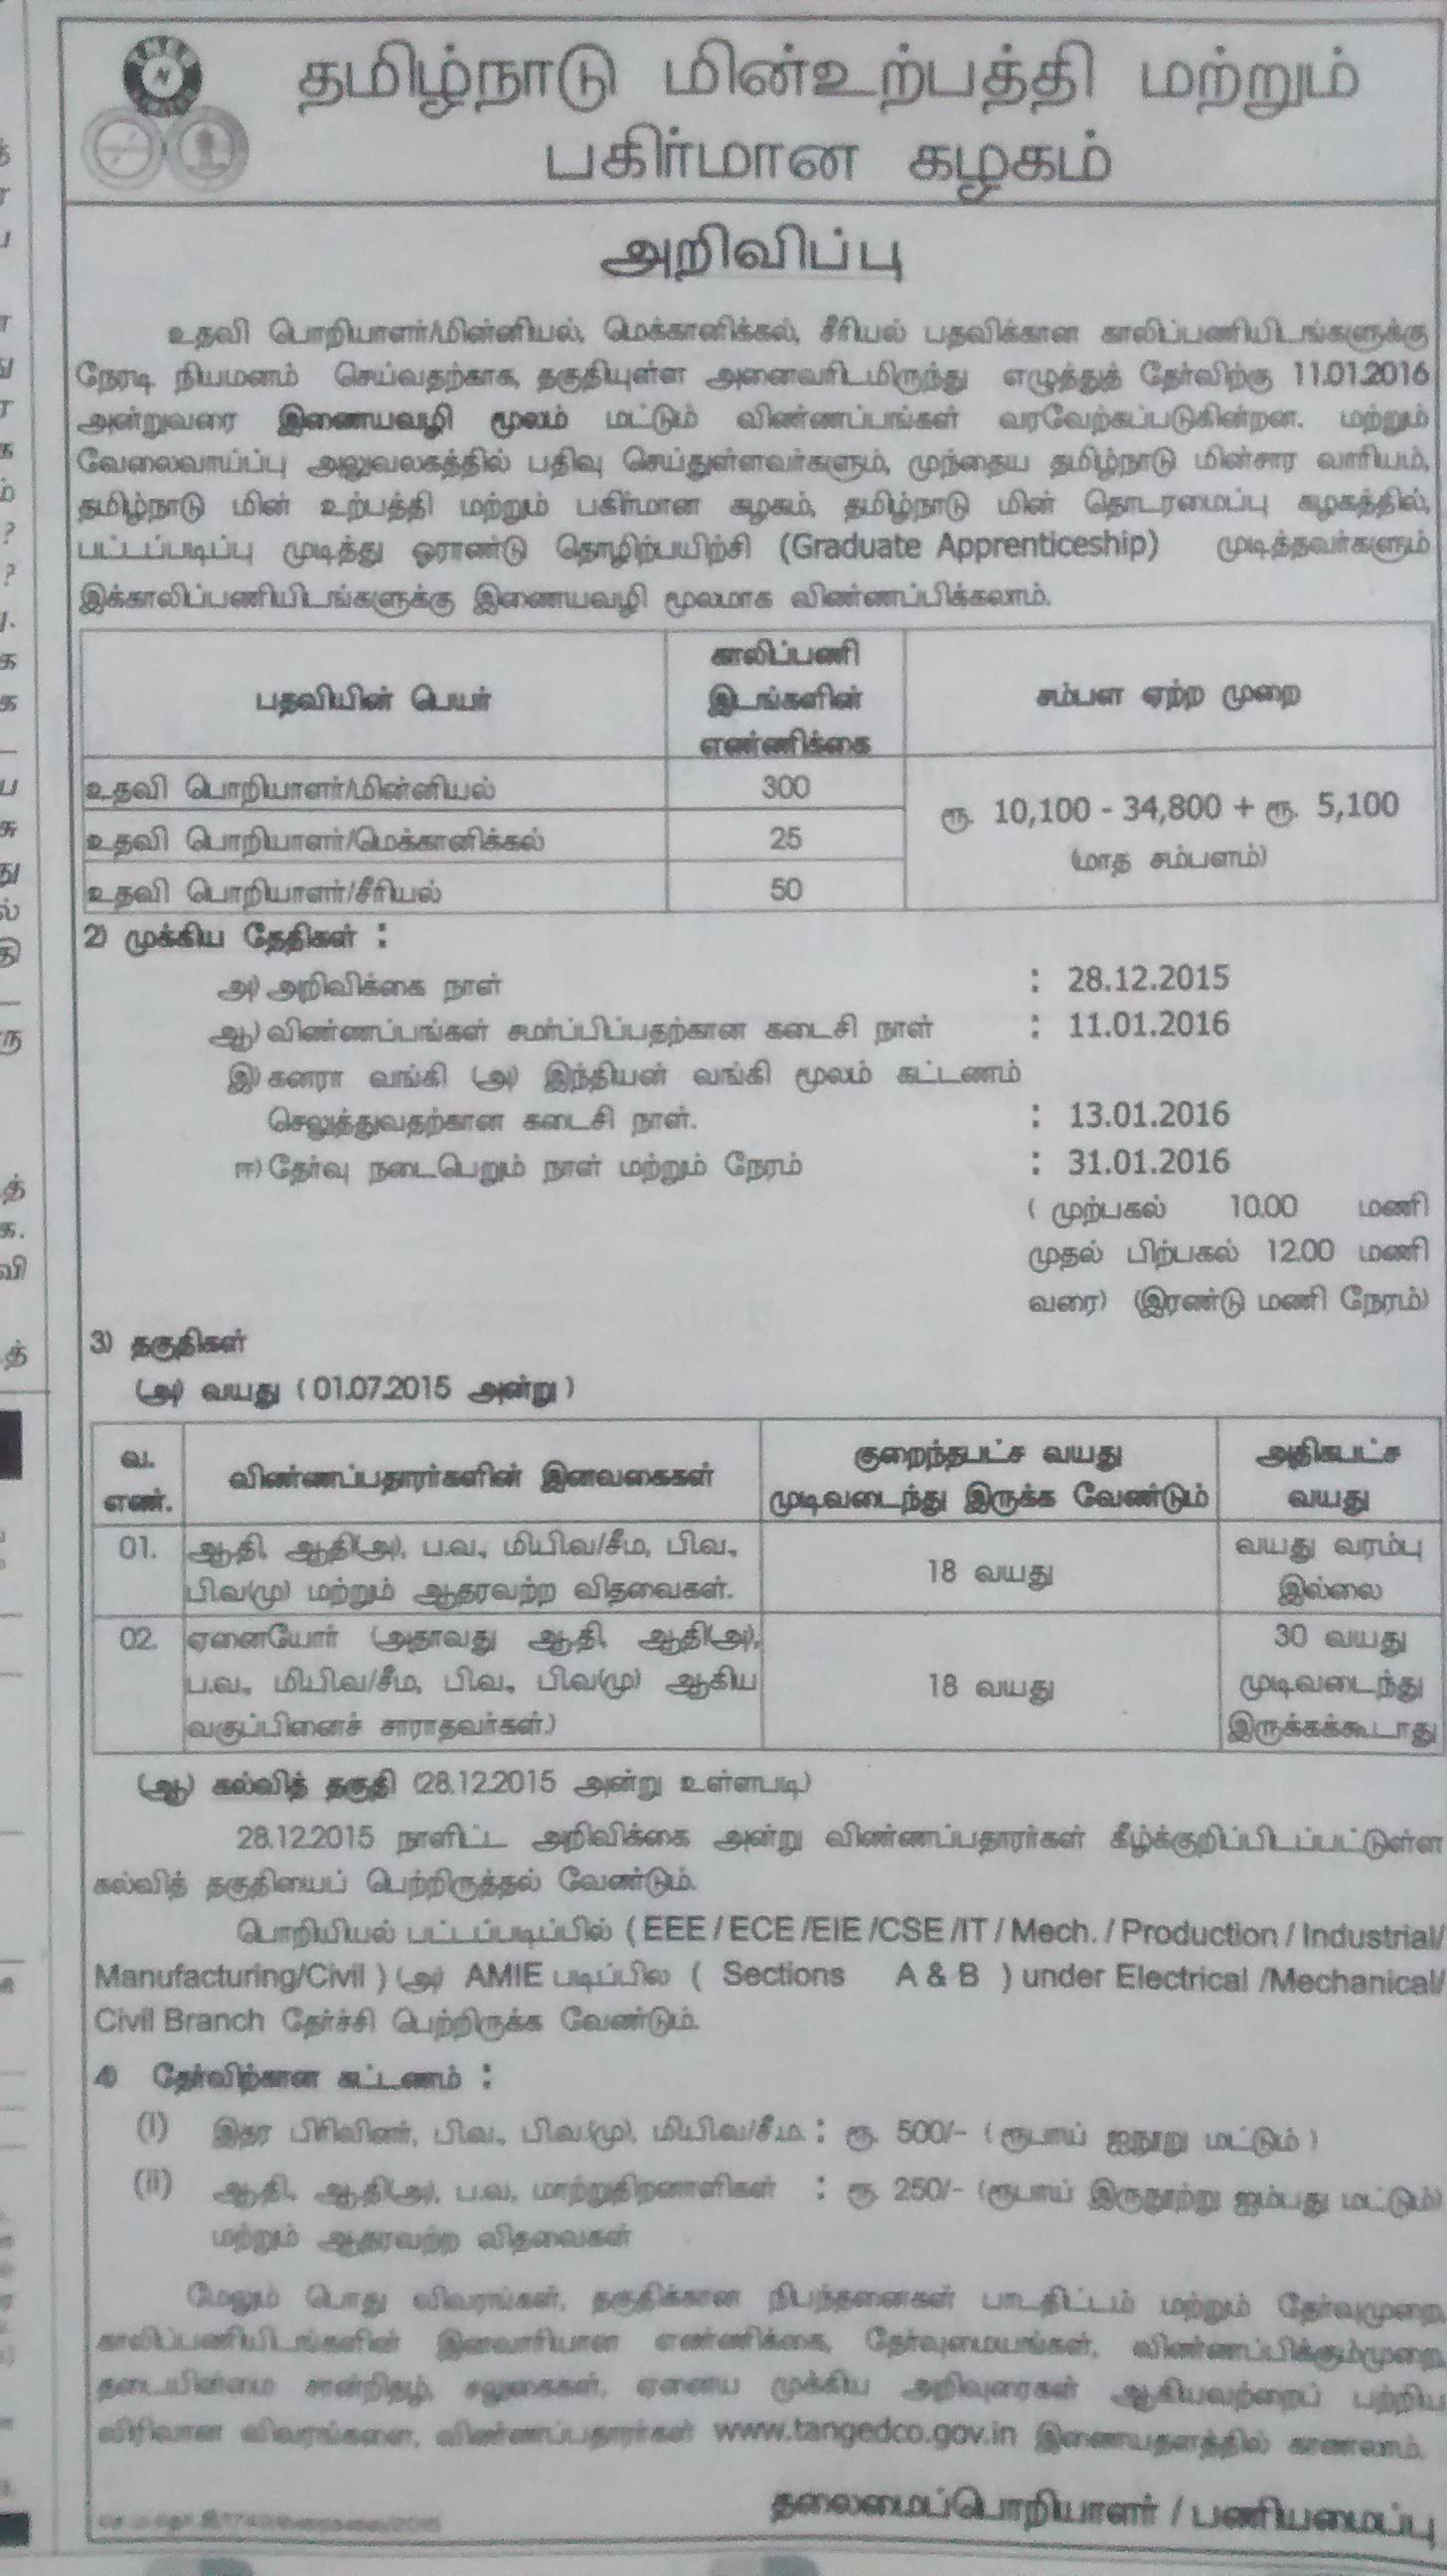 TNEB Recruitment Tamil Advertisement 28122015